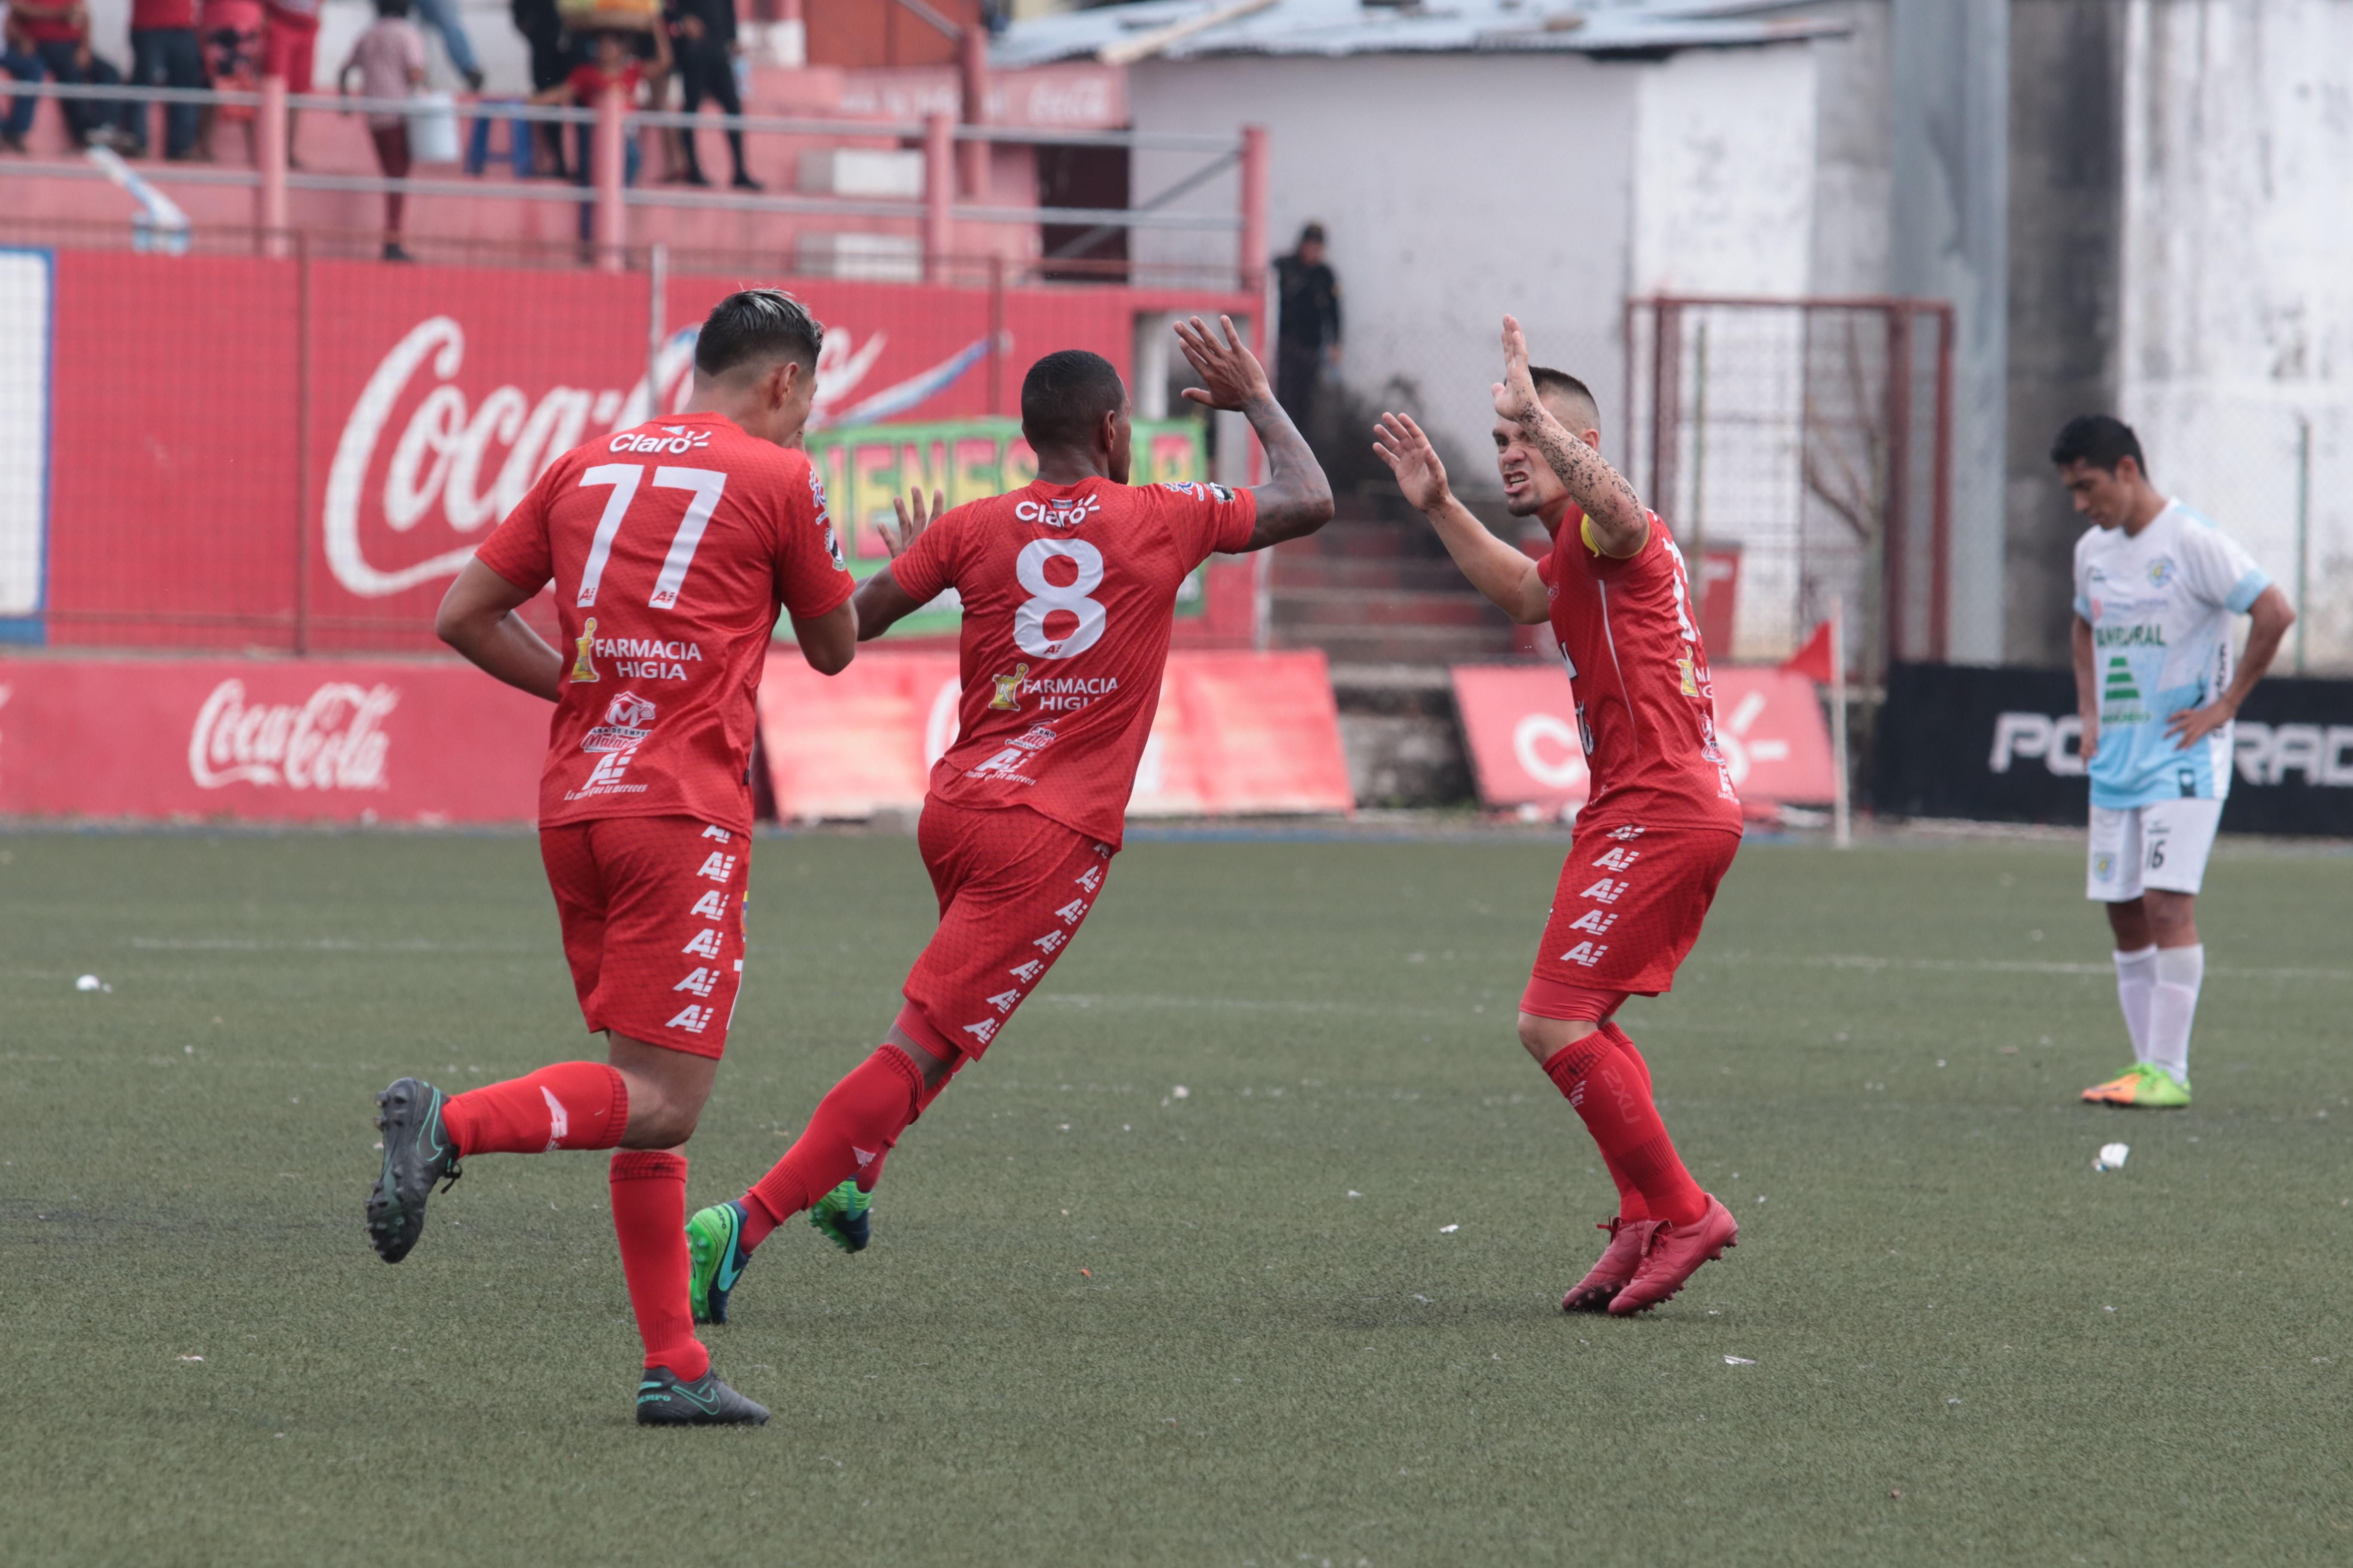 Kenny Cunningham celebra después de anotar el gol del empate para Malacateco. (Foto Prensa Libre: Raúl Juárez)